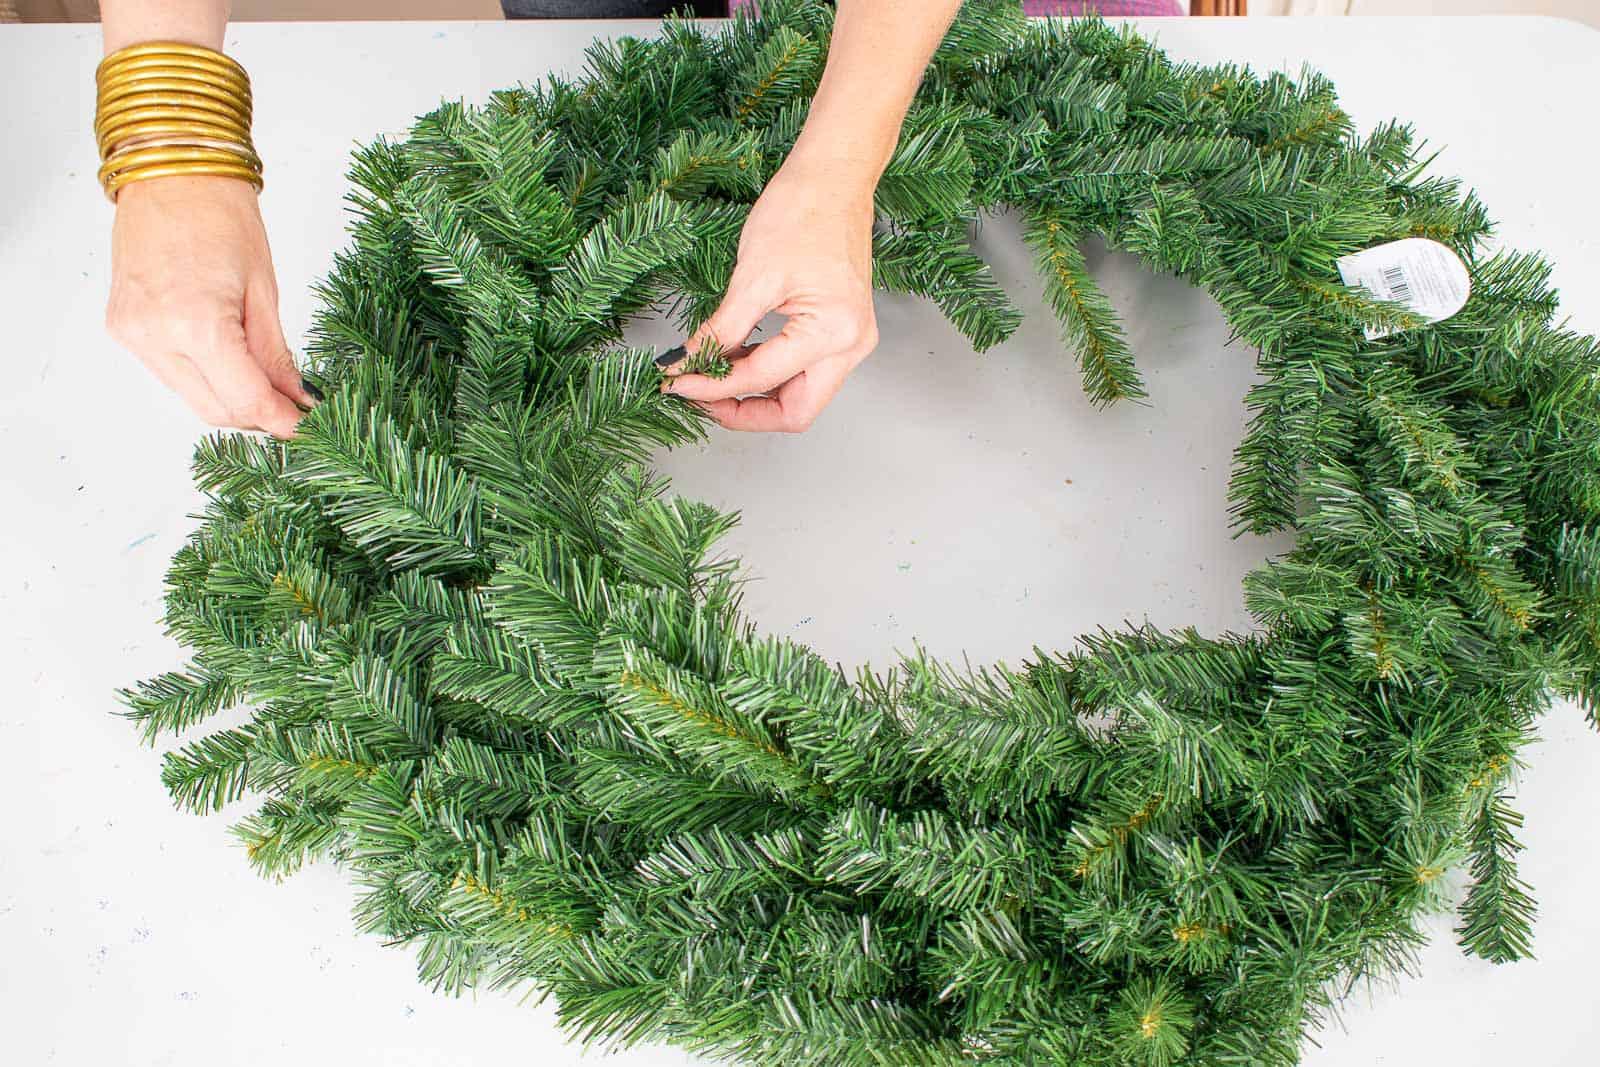 fluff the wreath